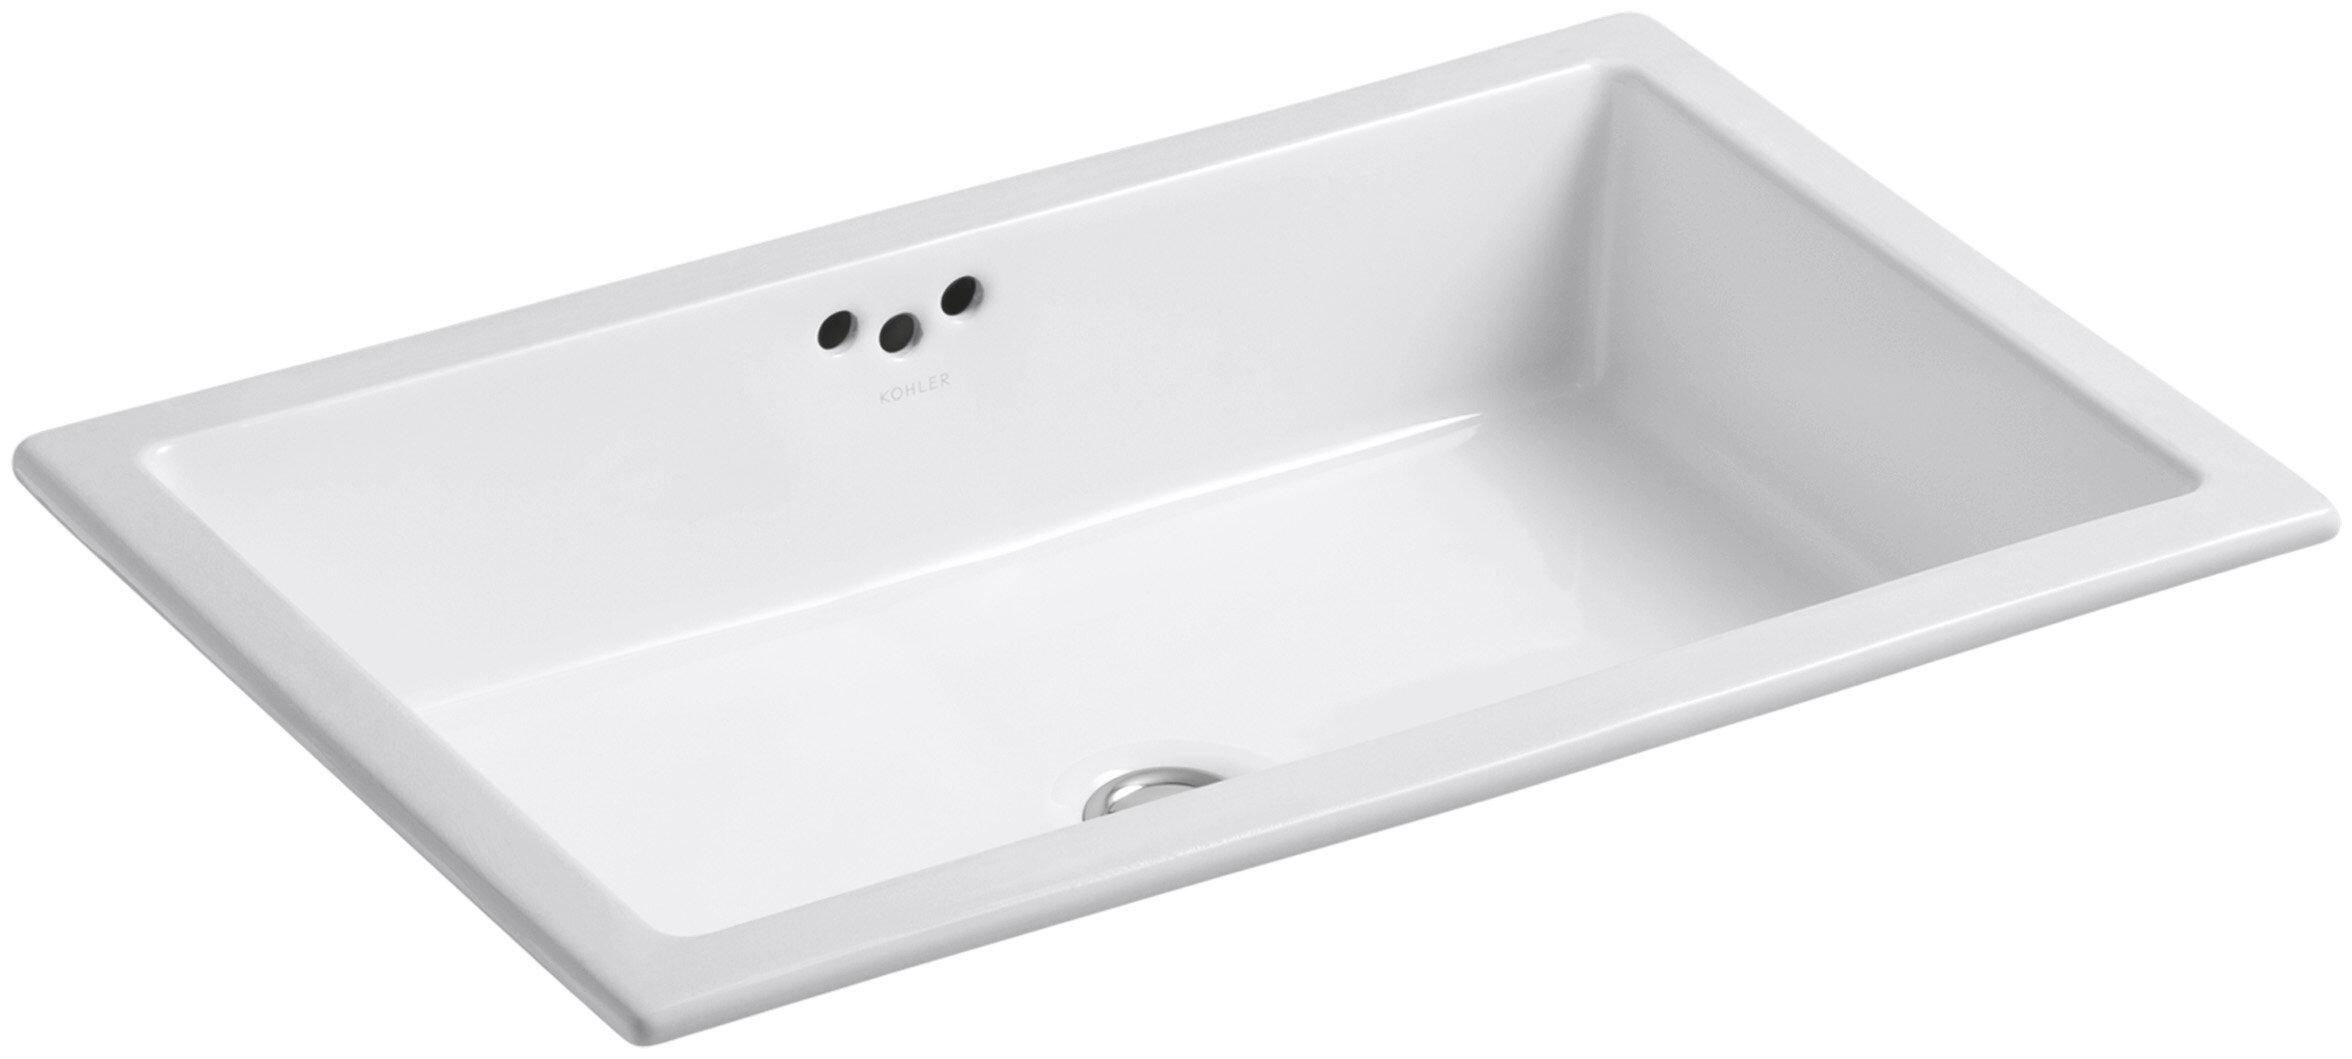 kraus sink undermount overflow elavo large ceramic w bathroom rectangular white kcu small